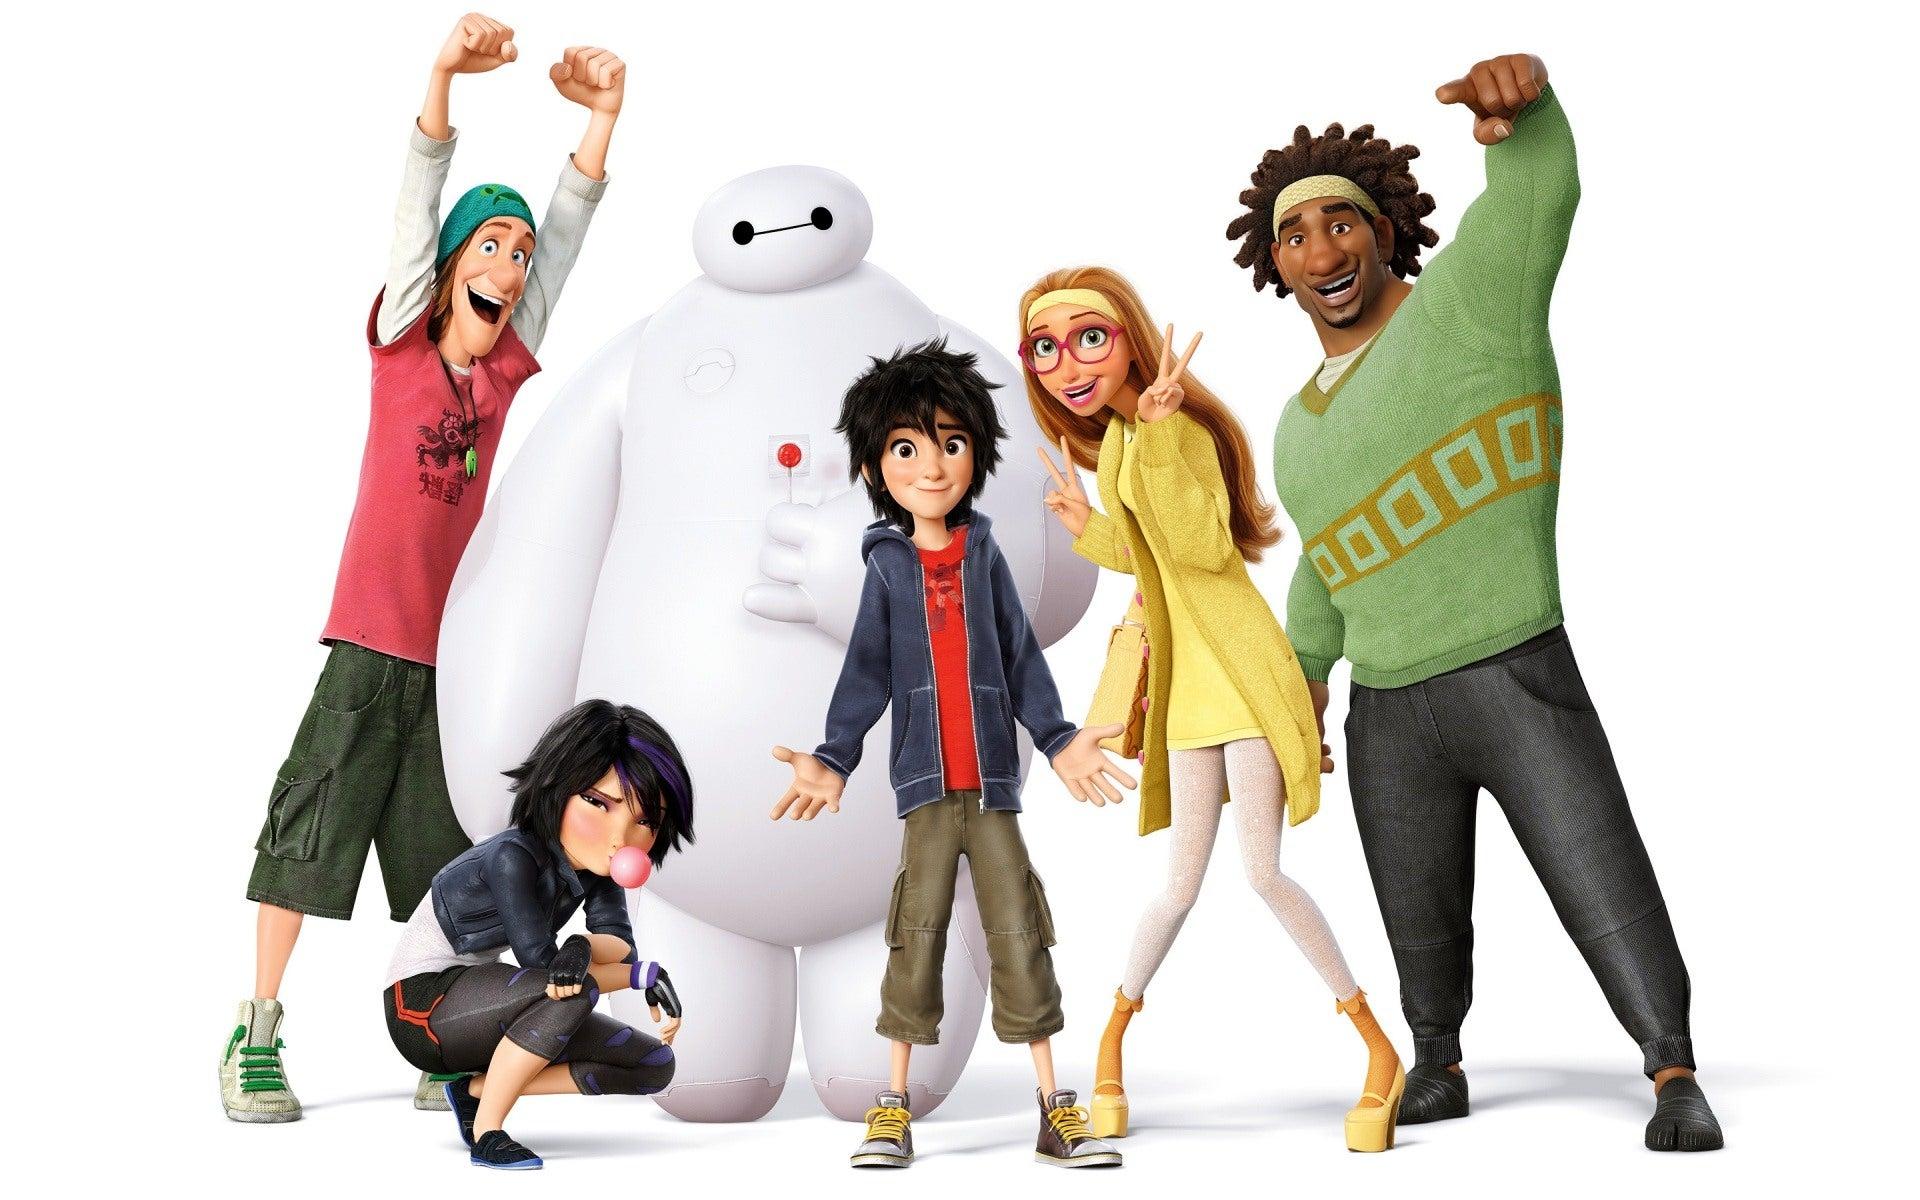 Big Hero 6 Anime Characters : Hand drawn big hero six trailer promotes opening in japan